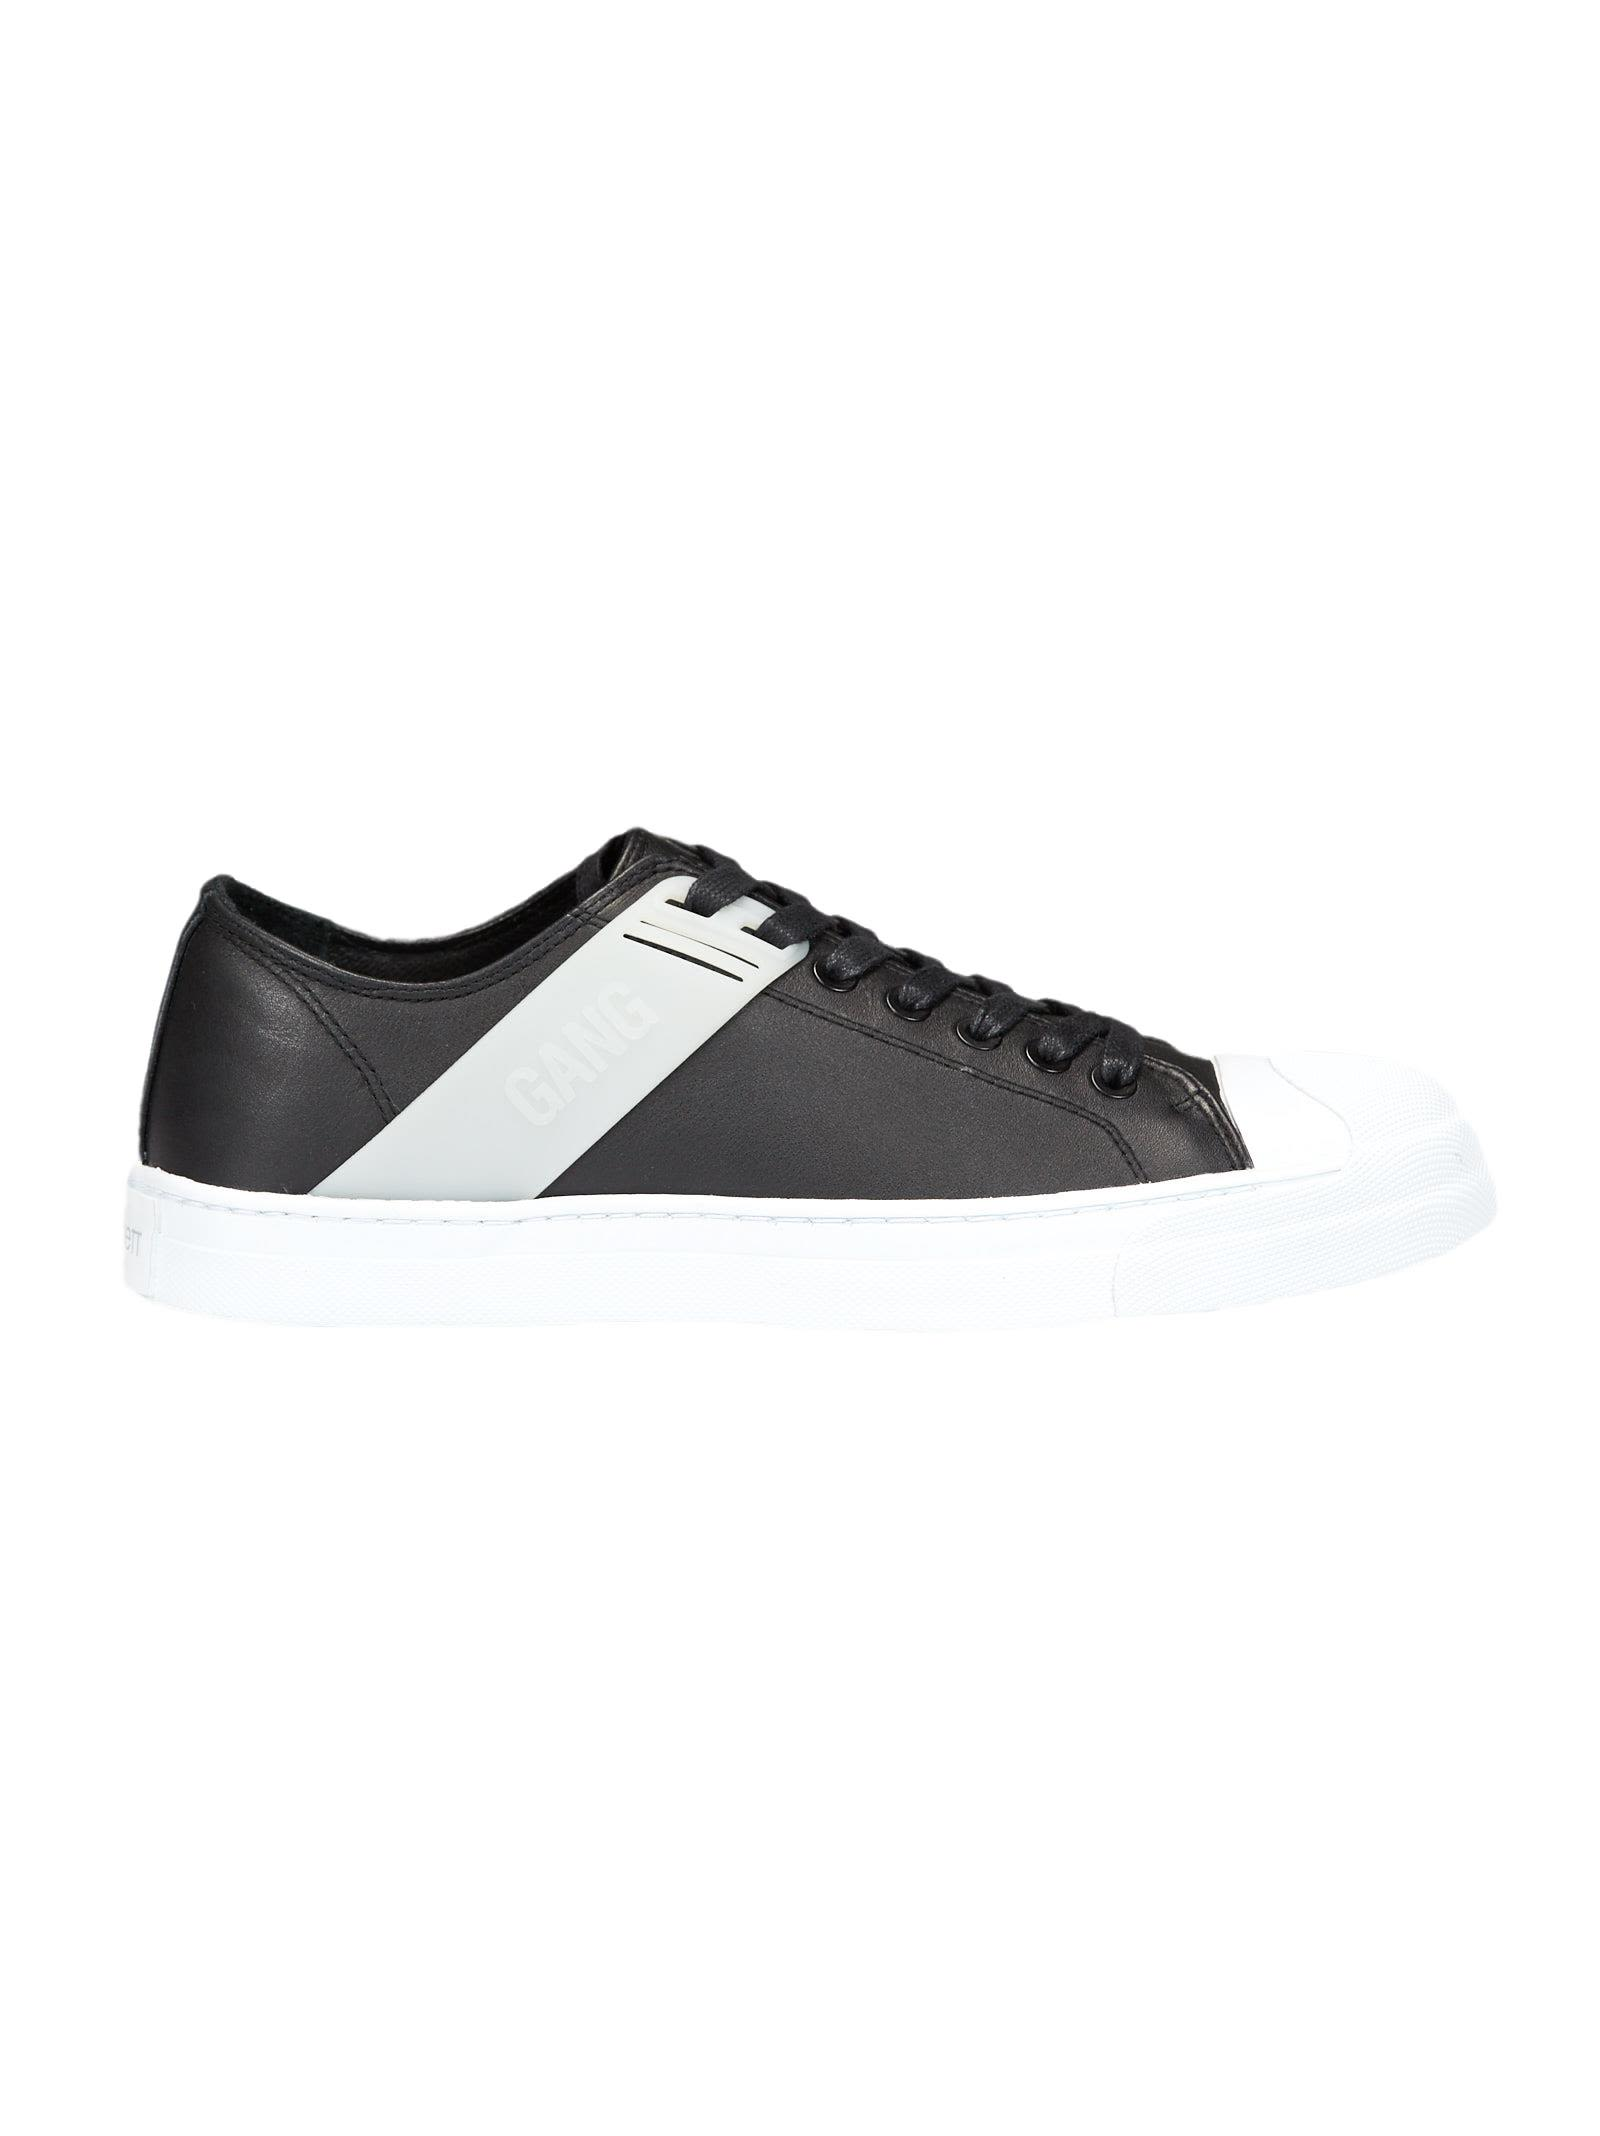 Gang sneakers - White Neil Barrett m2QCho4I